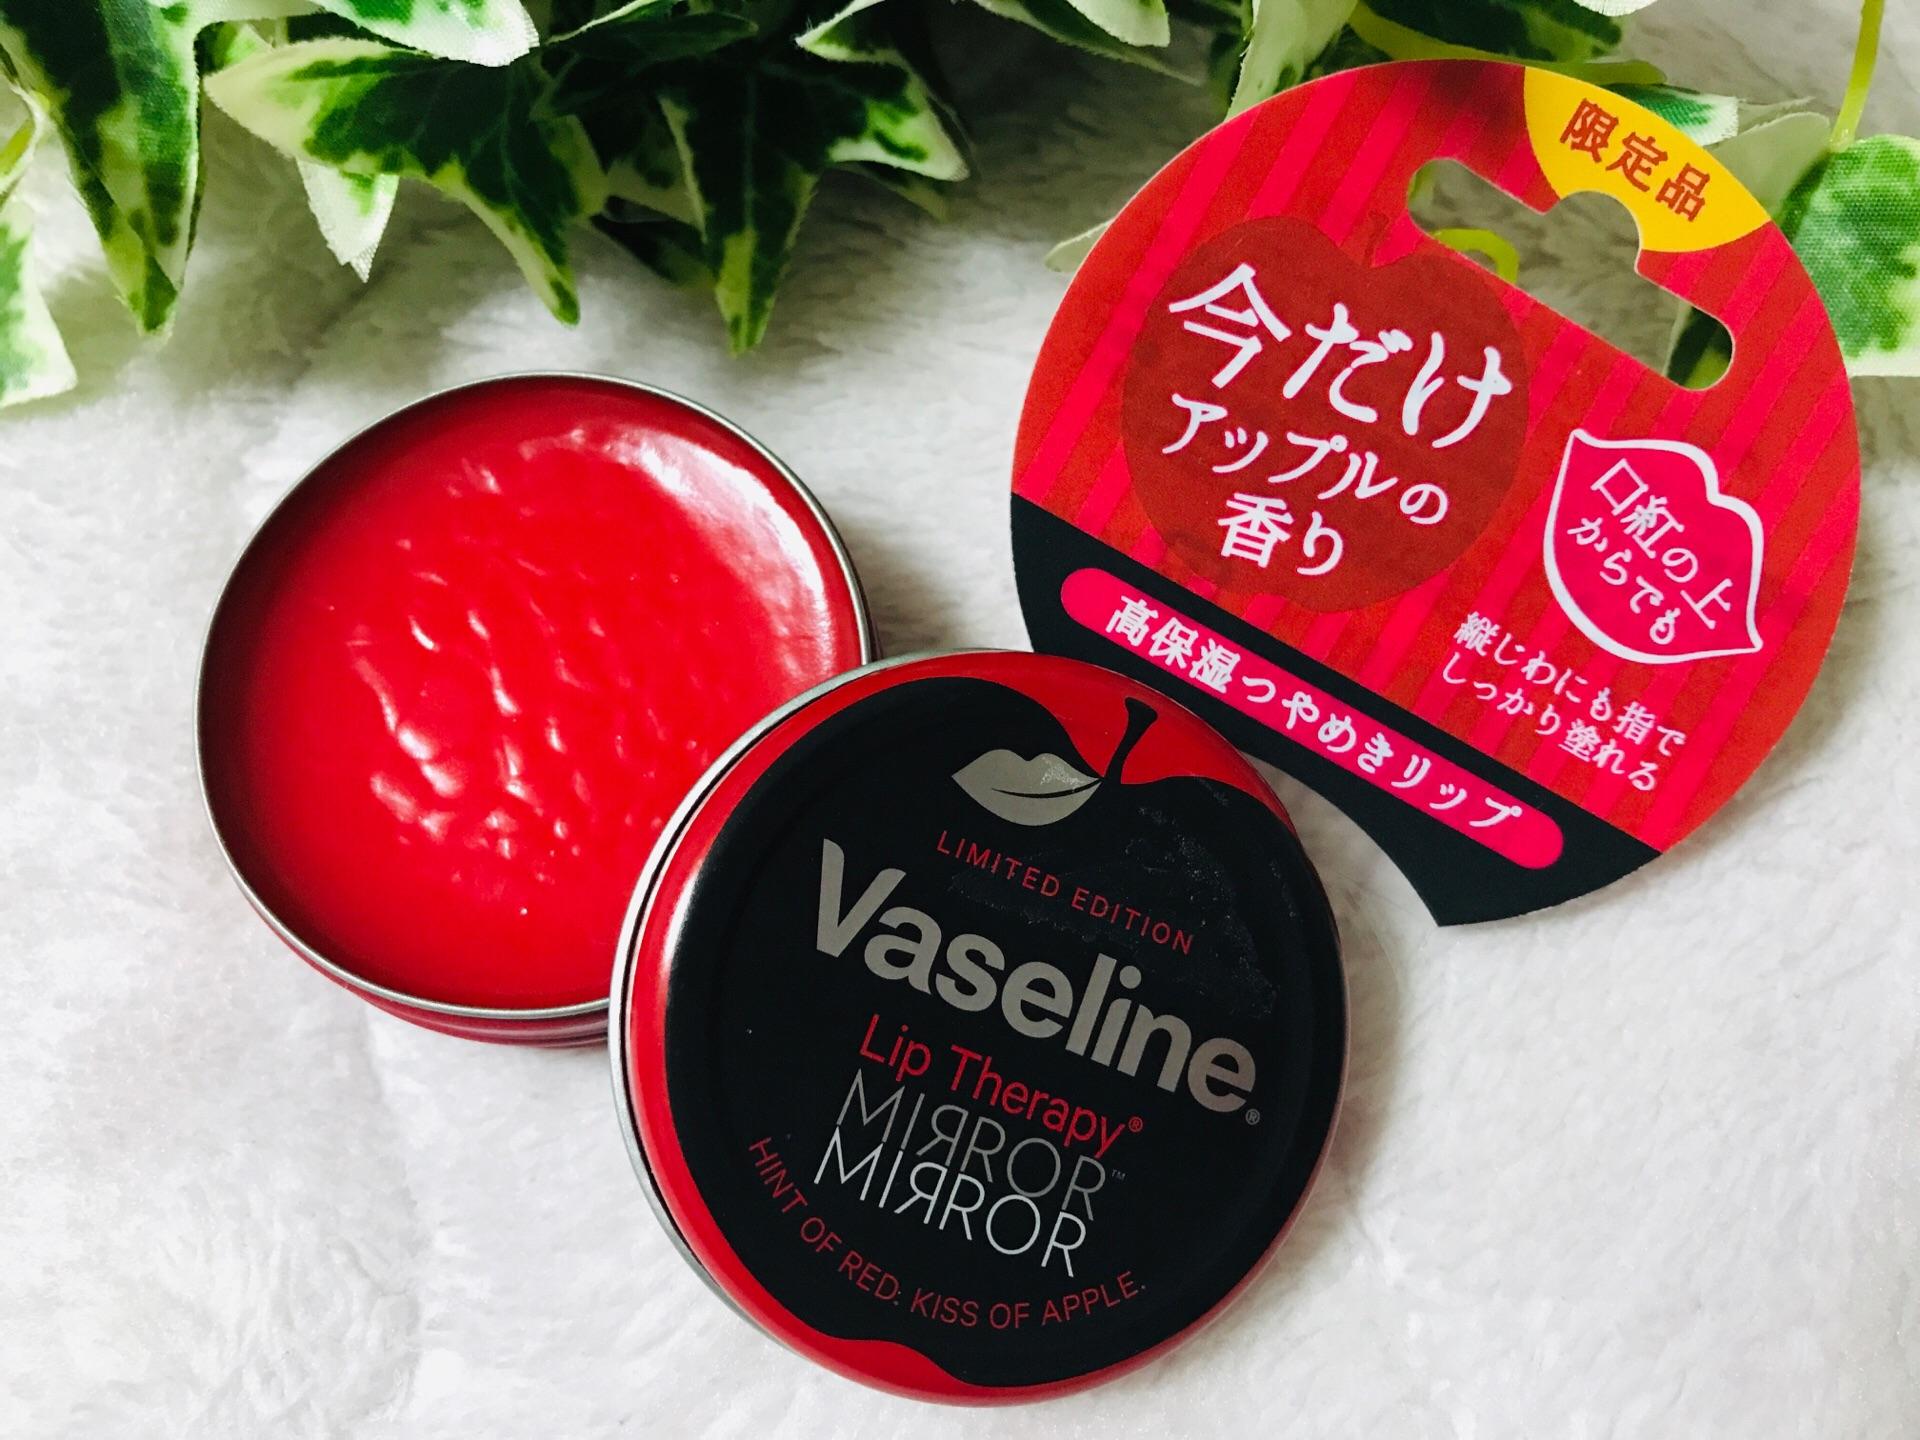 【Vaseline】2018年限定!保湿力を誇る大人気リップから《アップルの香り》が限定販売中♡_5